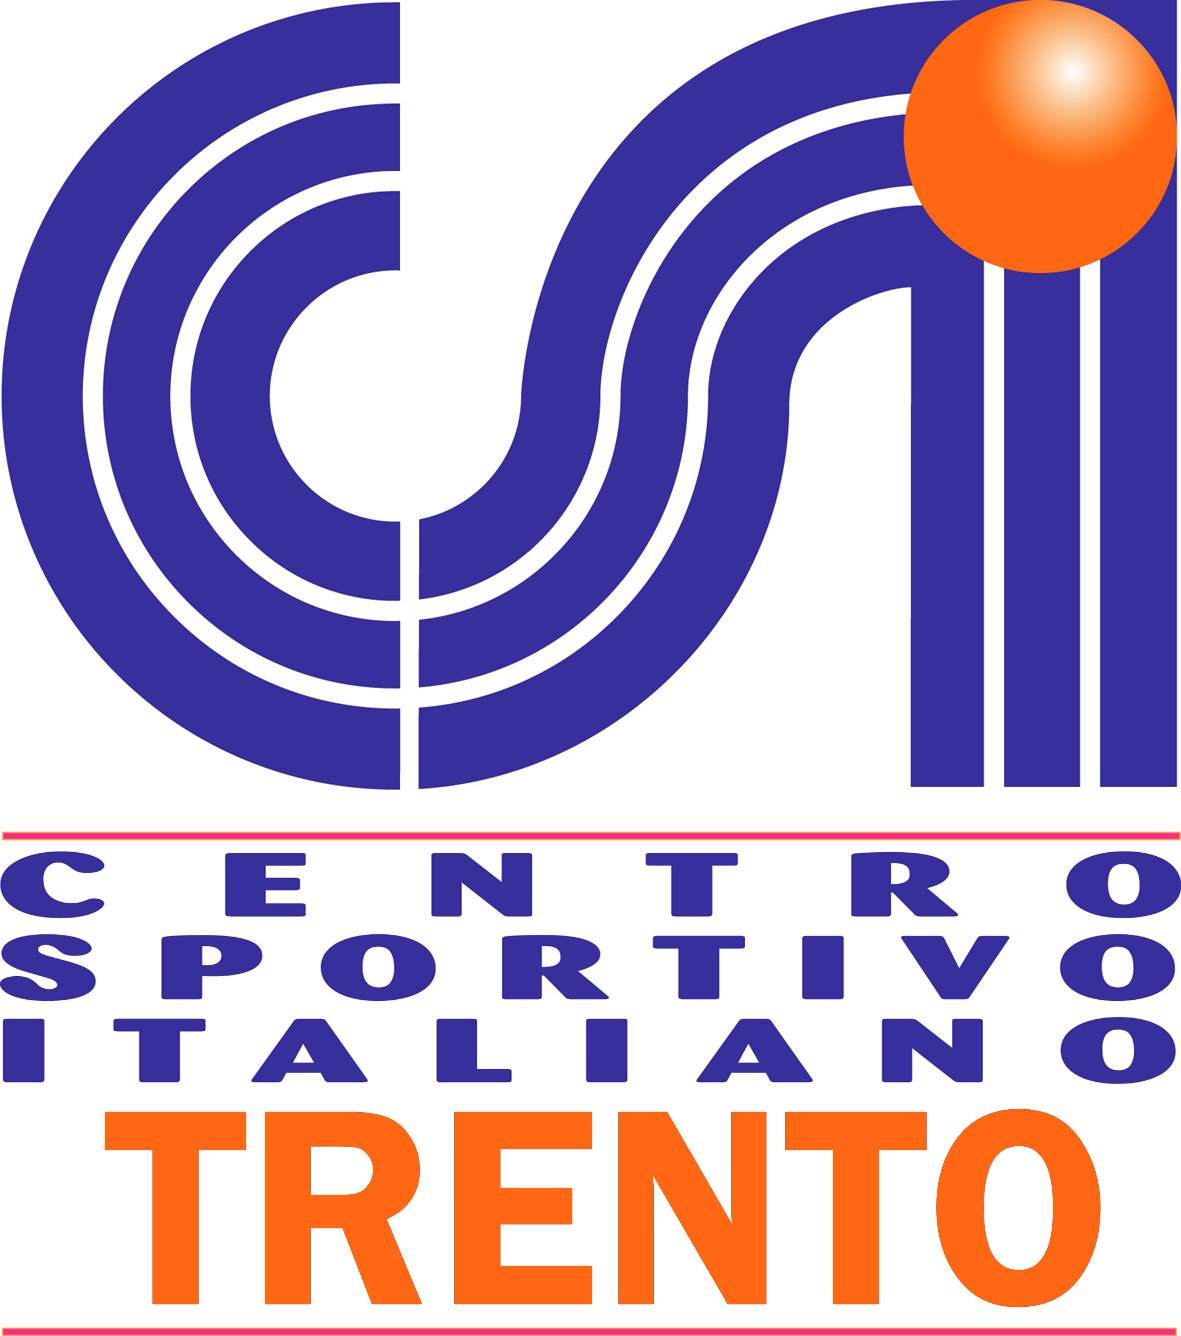 Calendario Csi.Calendario Csi Estivo In Pdf Scaricabile Atletica Valle